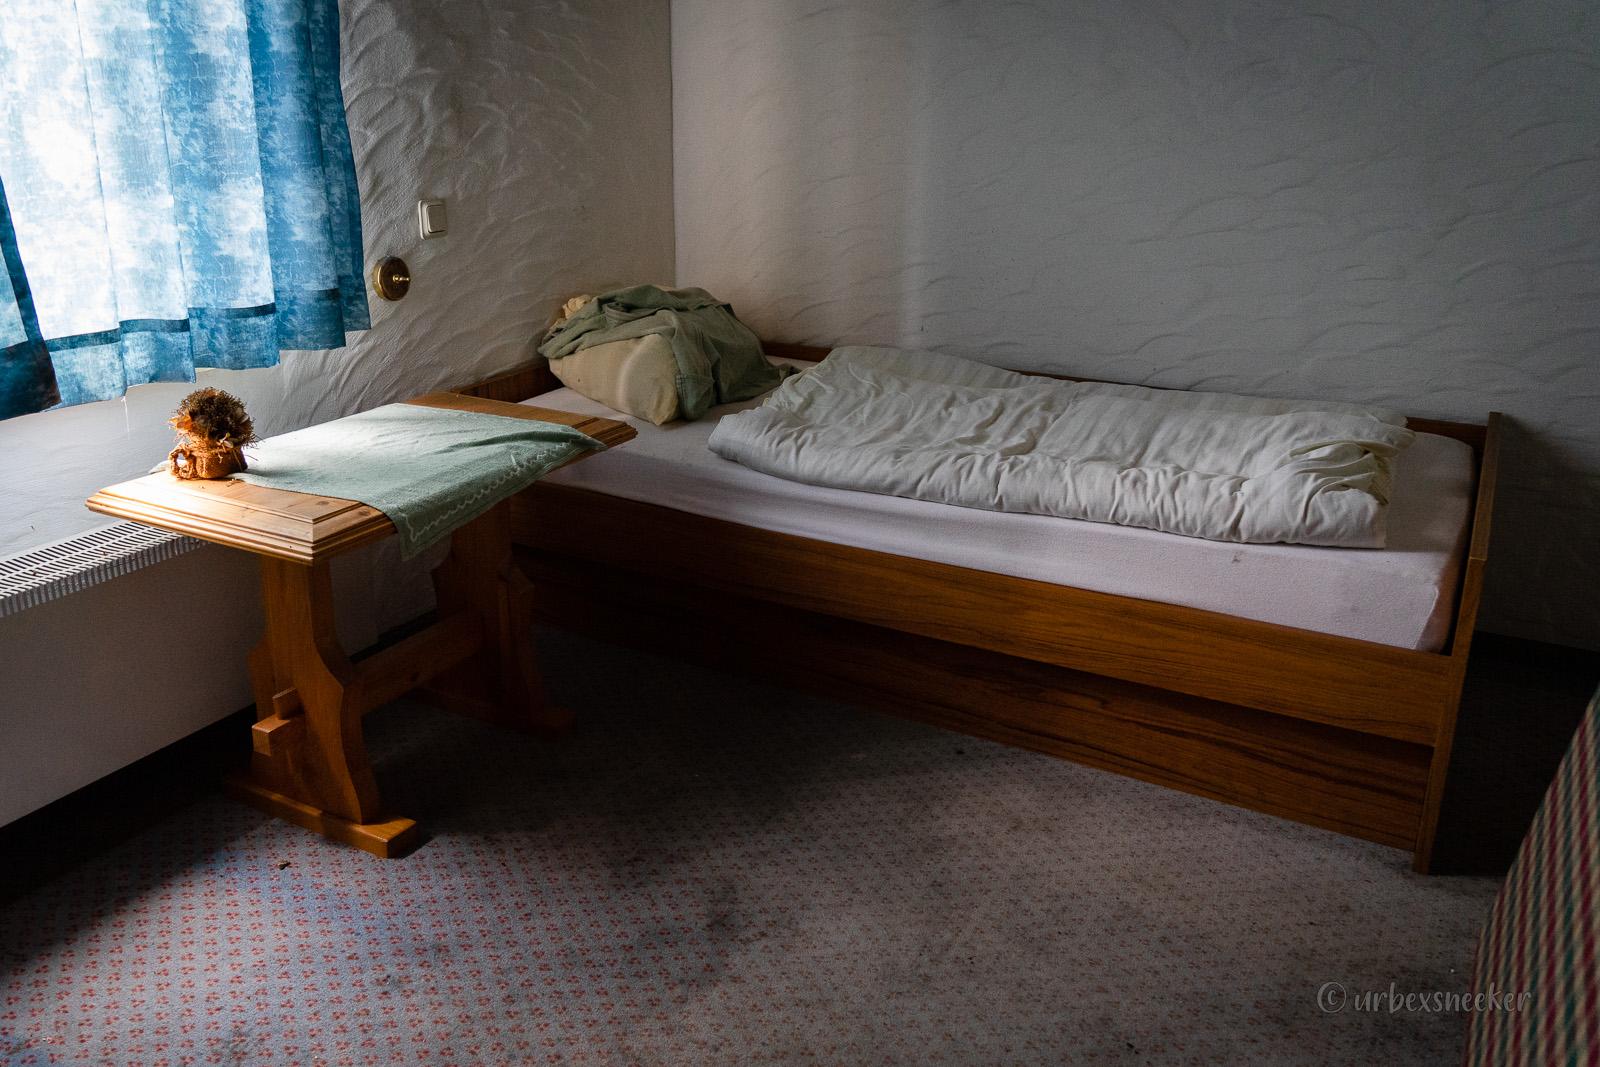 lost place holz-hotel einzelzimmer DSC00288